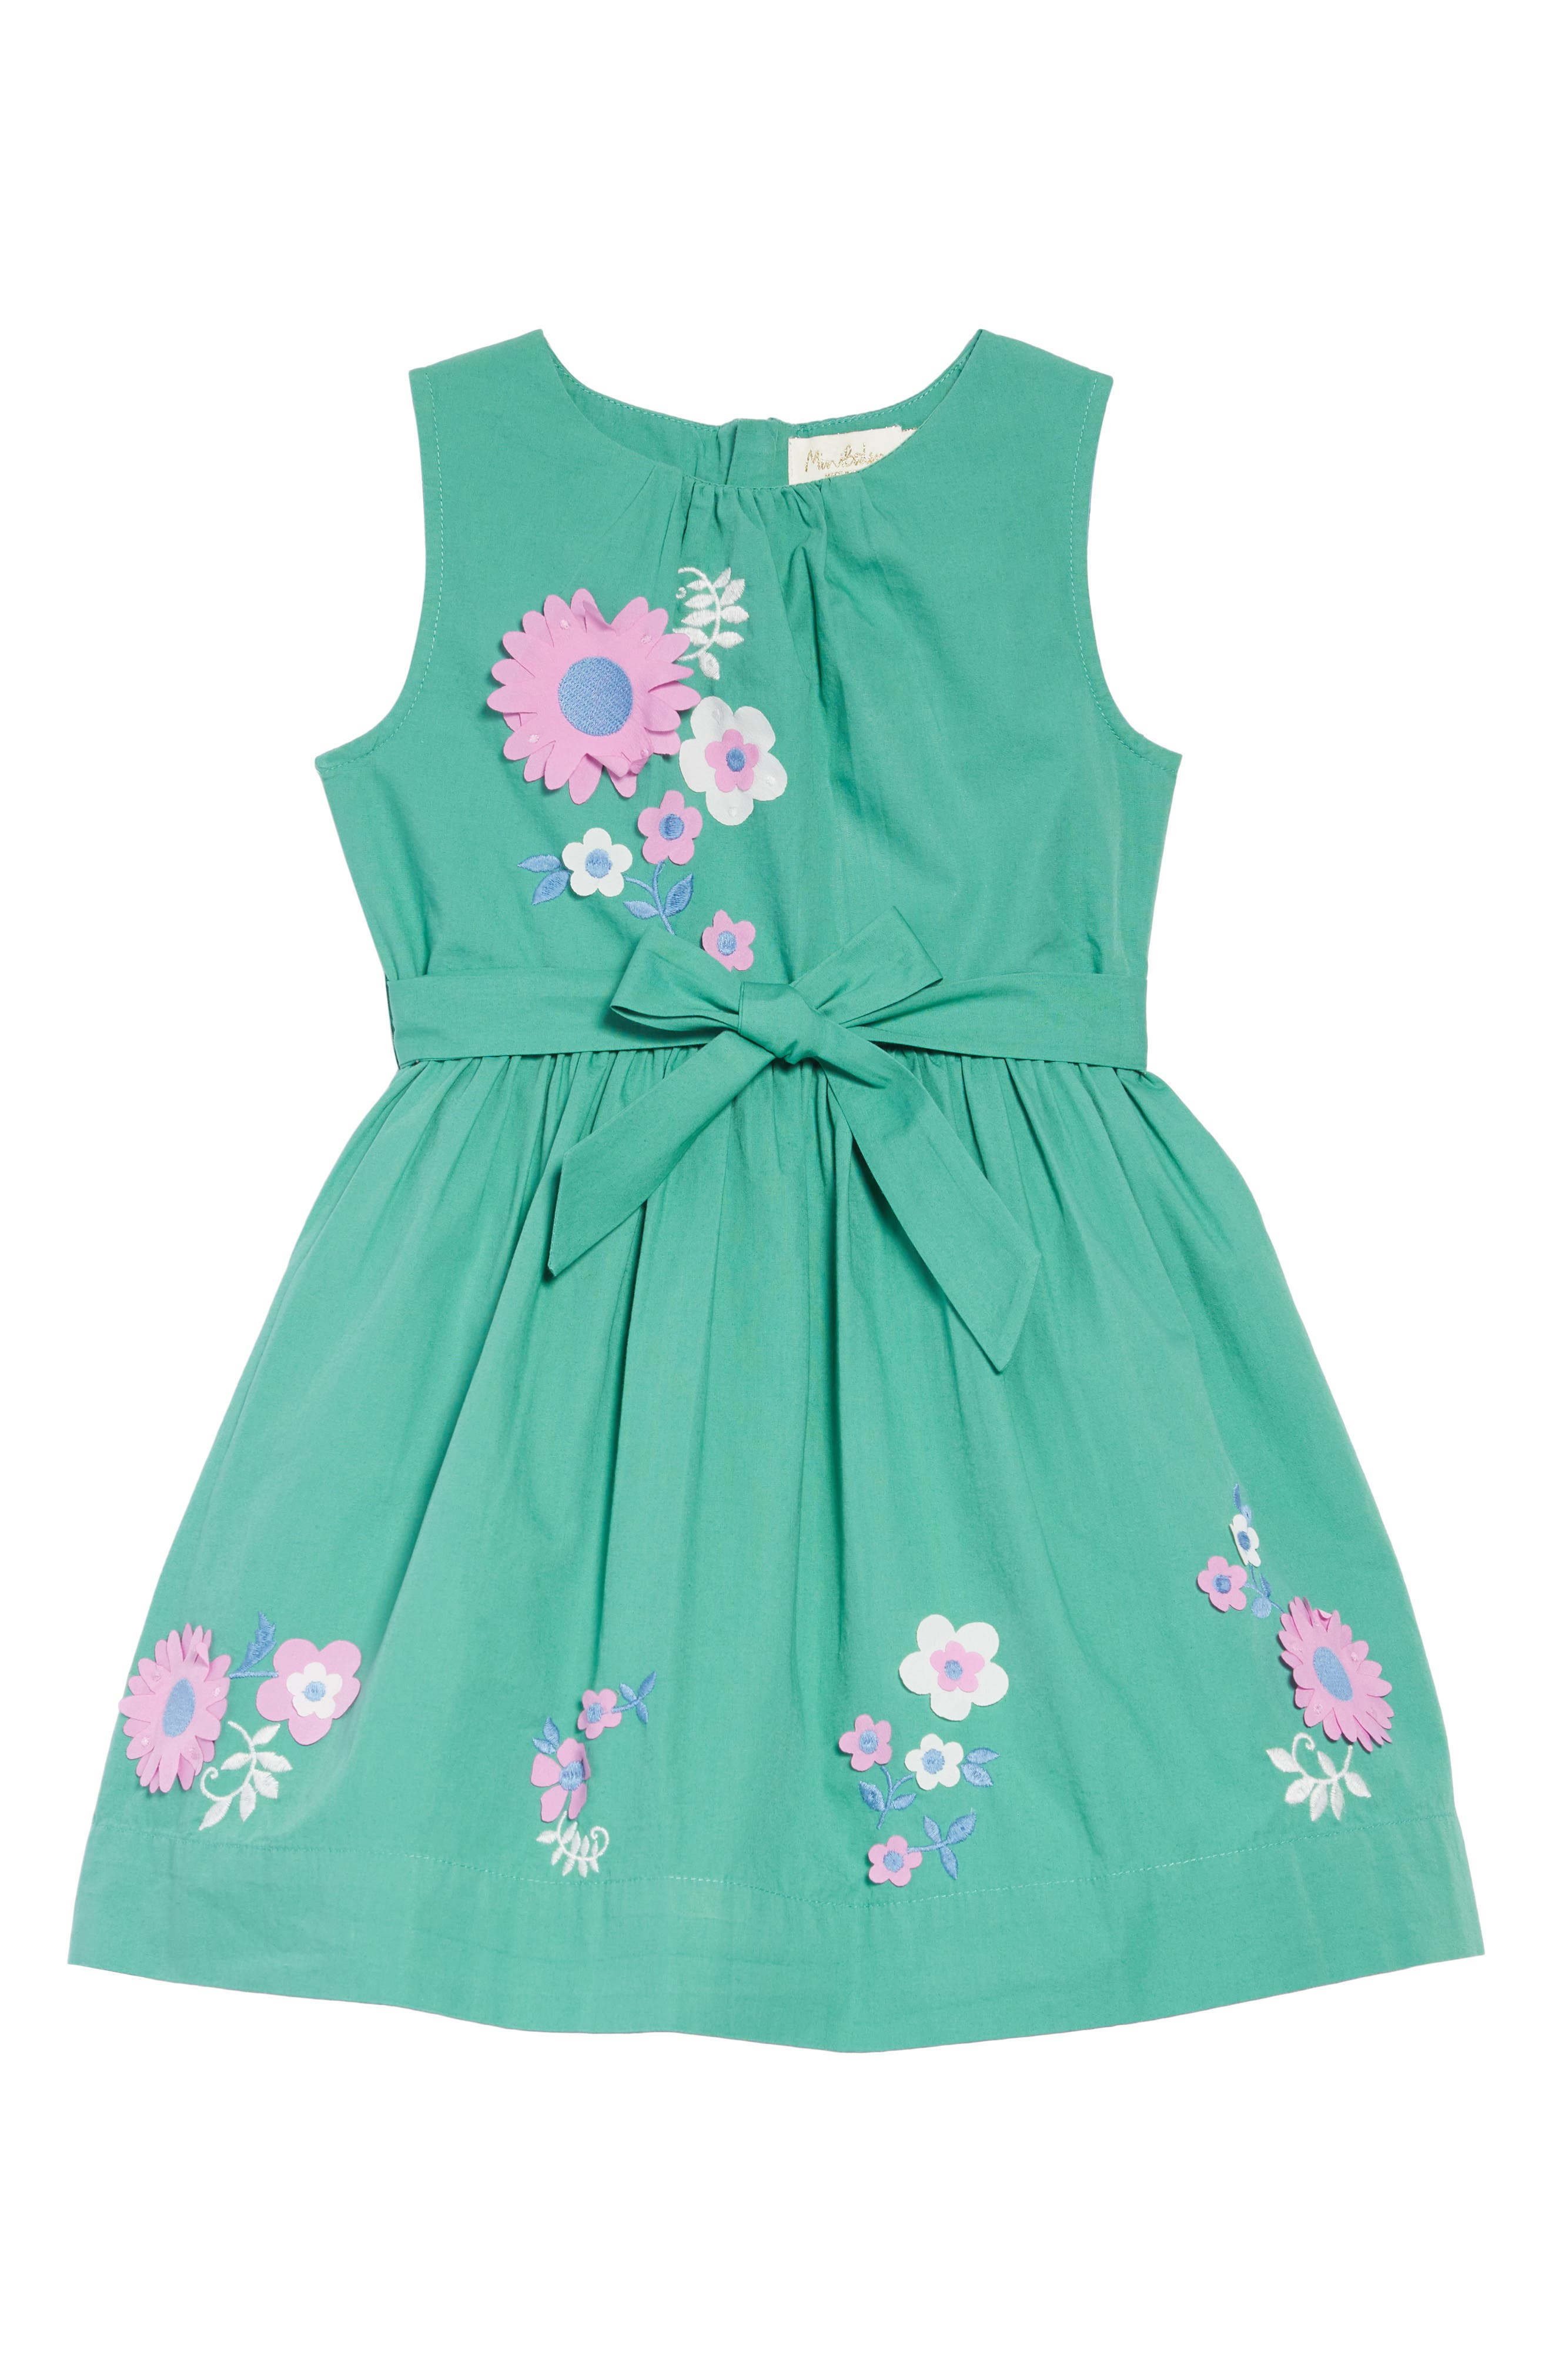 8816f0bb8be Mini Boden Kids  Clothing